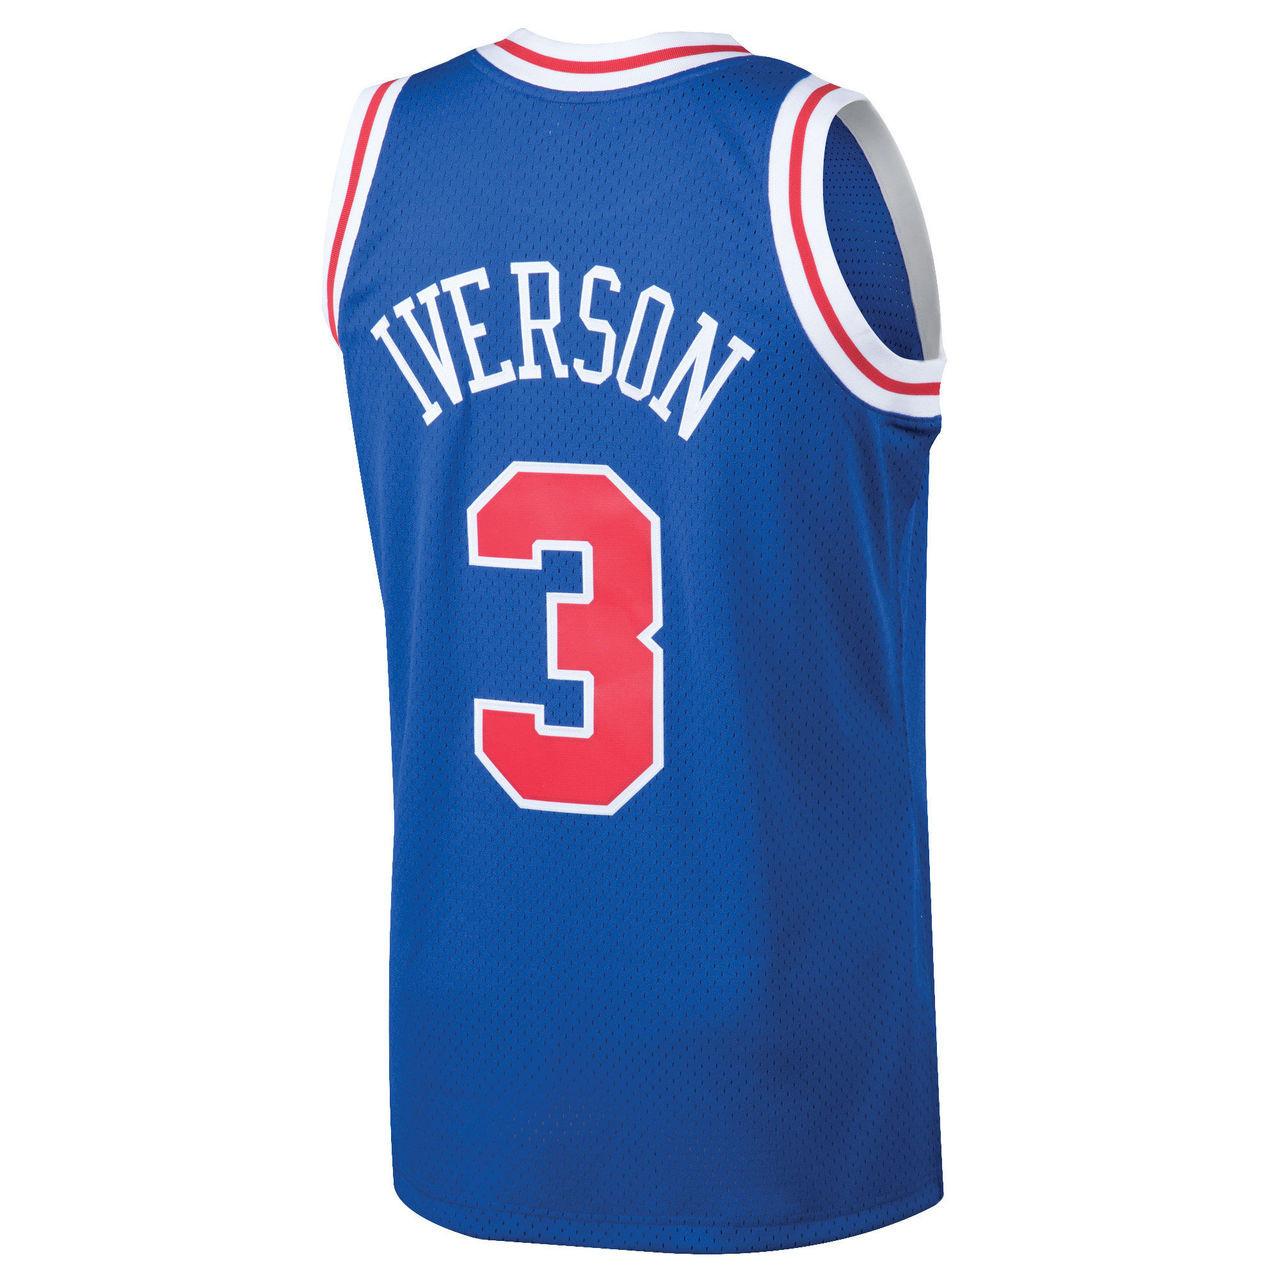 4489d0fe9 Allen Iverson Philadelphia 76ers Mitchell   Ness 1996-97 Hardwood ...